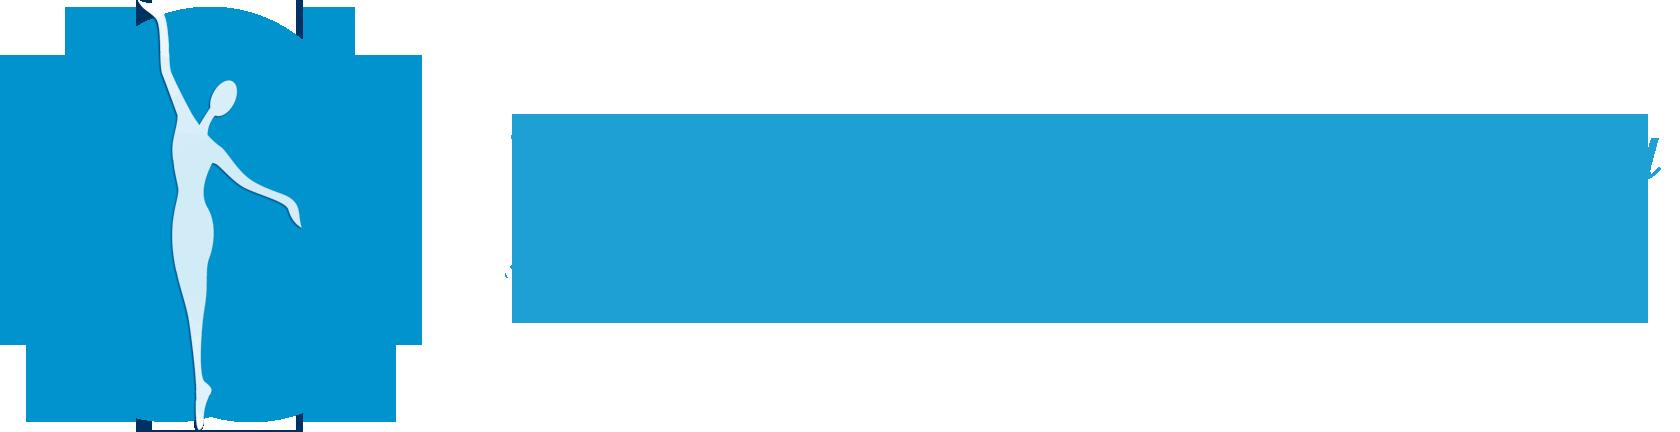 Центр пластической хирургии при РАН